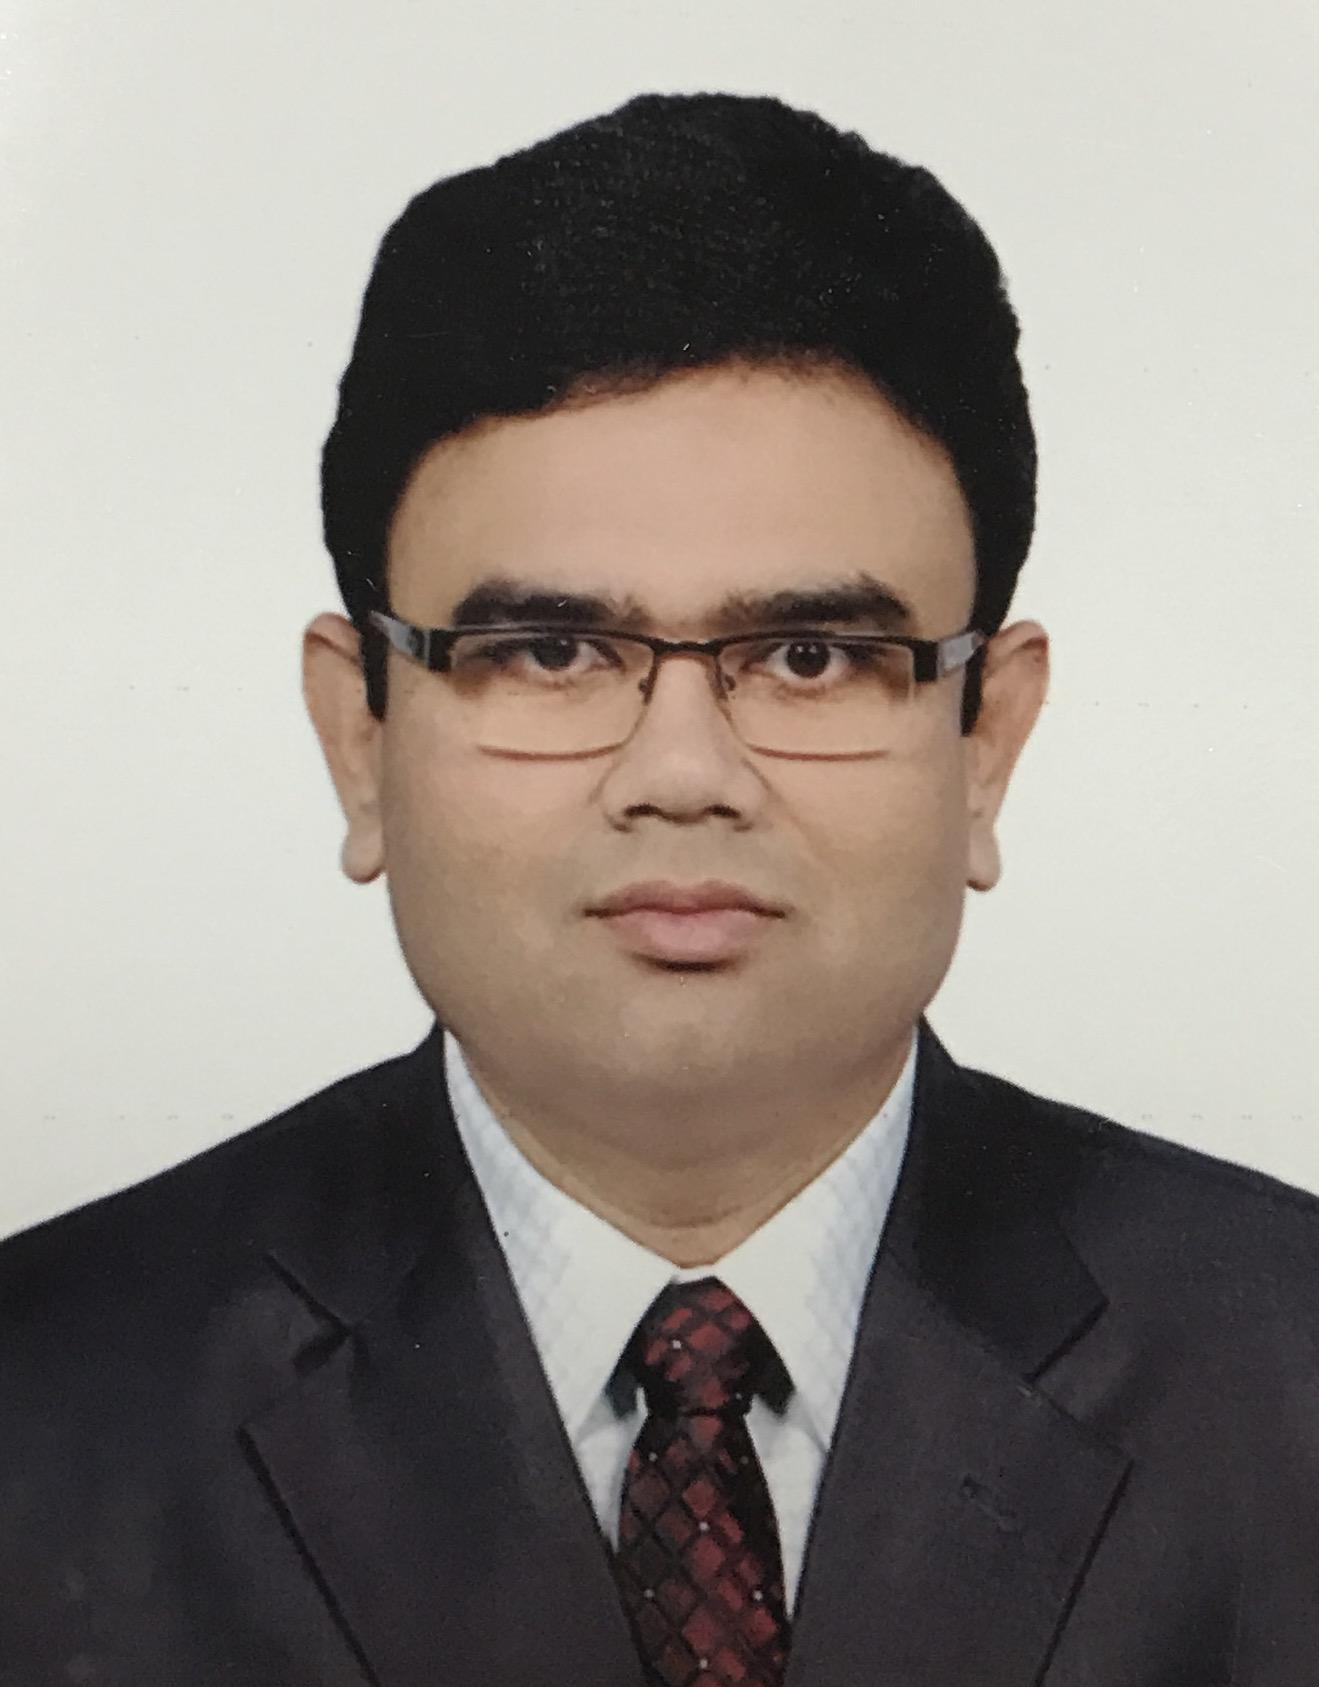 Subrata Kumar Dey